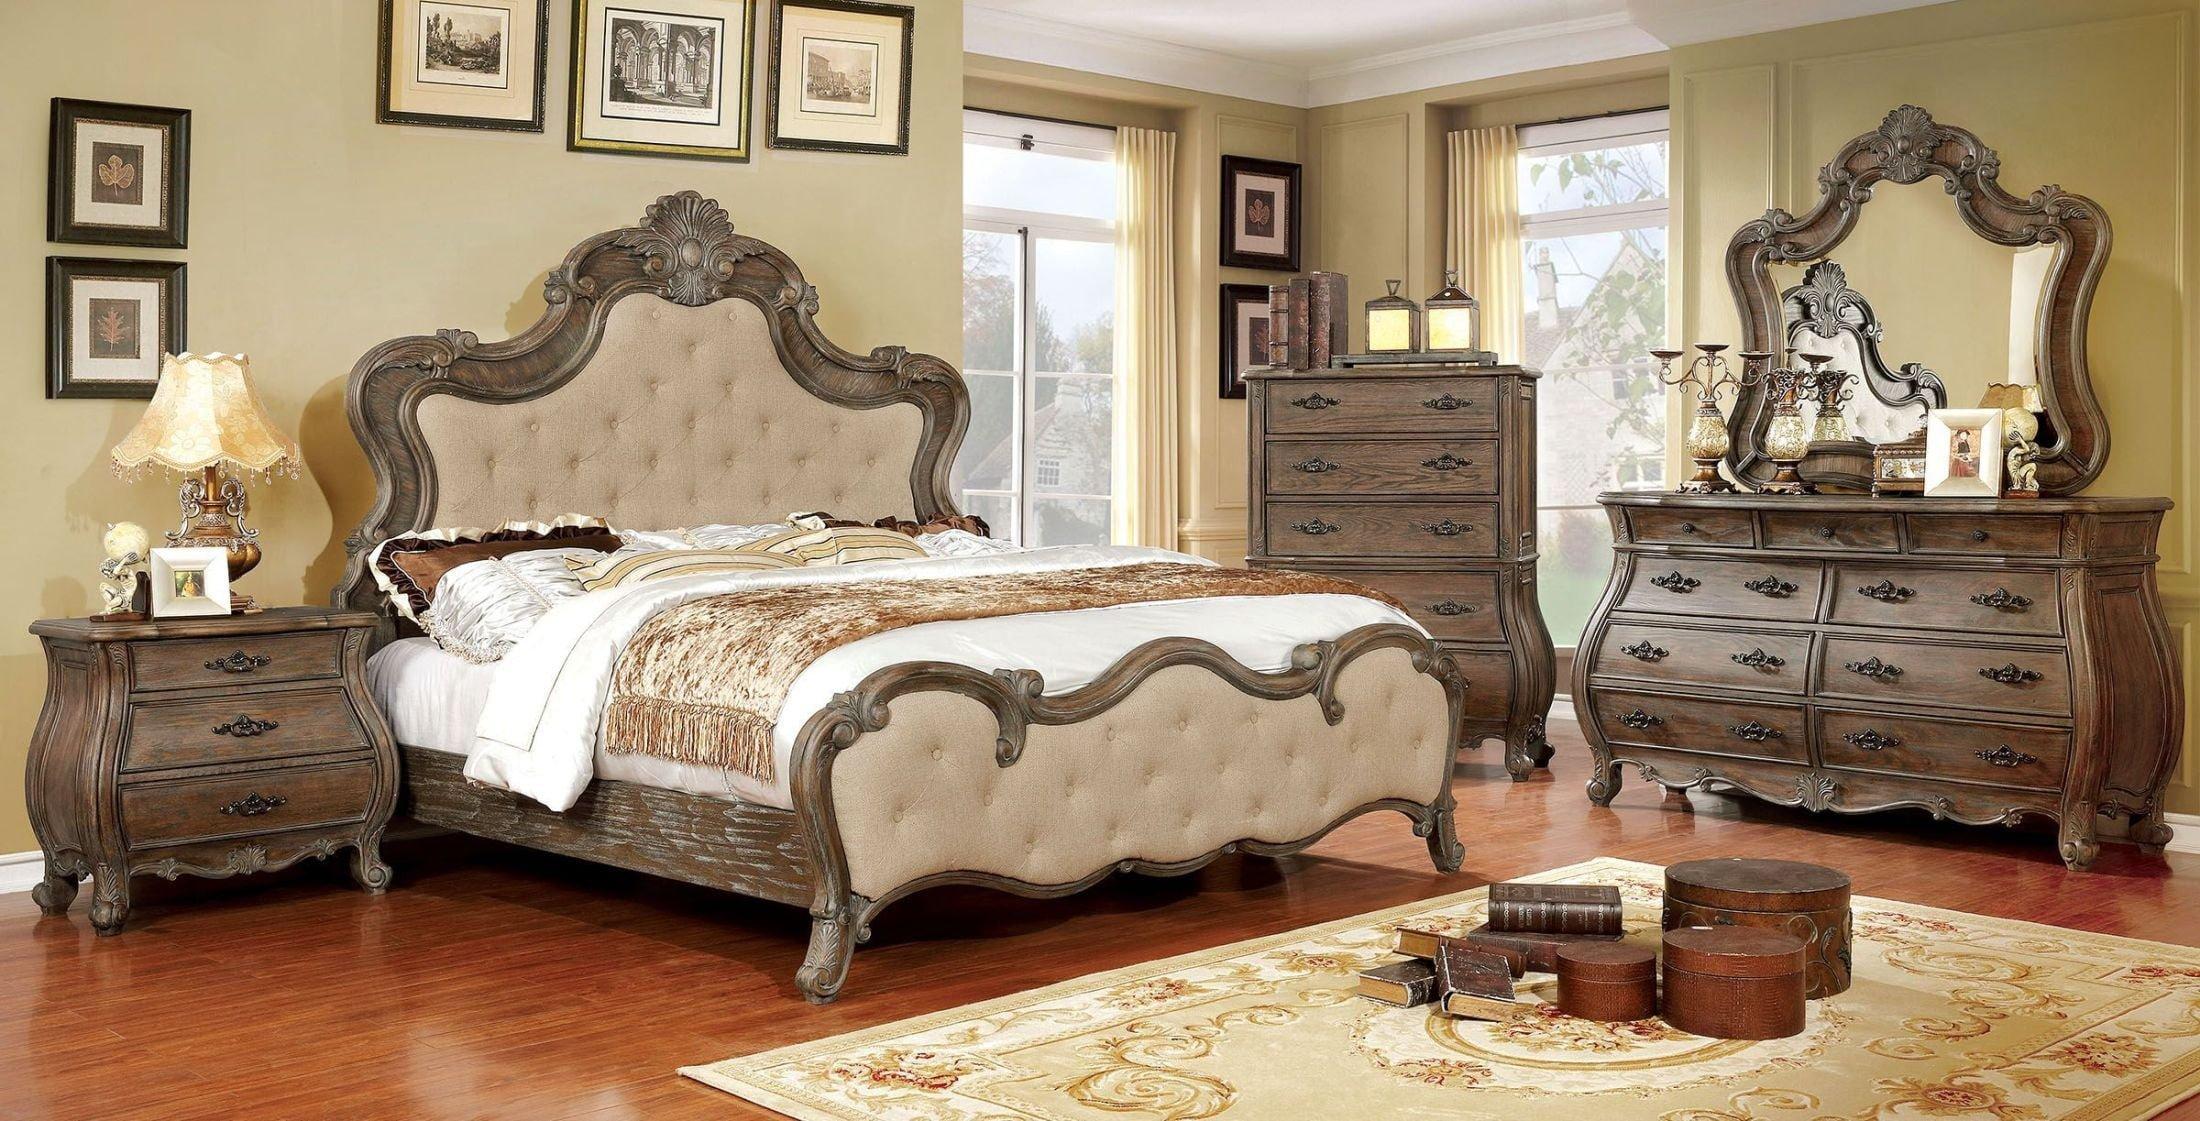 Acme Furniture Bedroom Set Luxury Cursa Rustic Natural Panel Bedroom Set